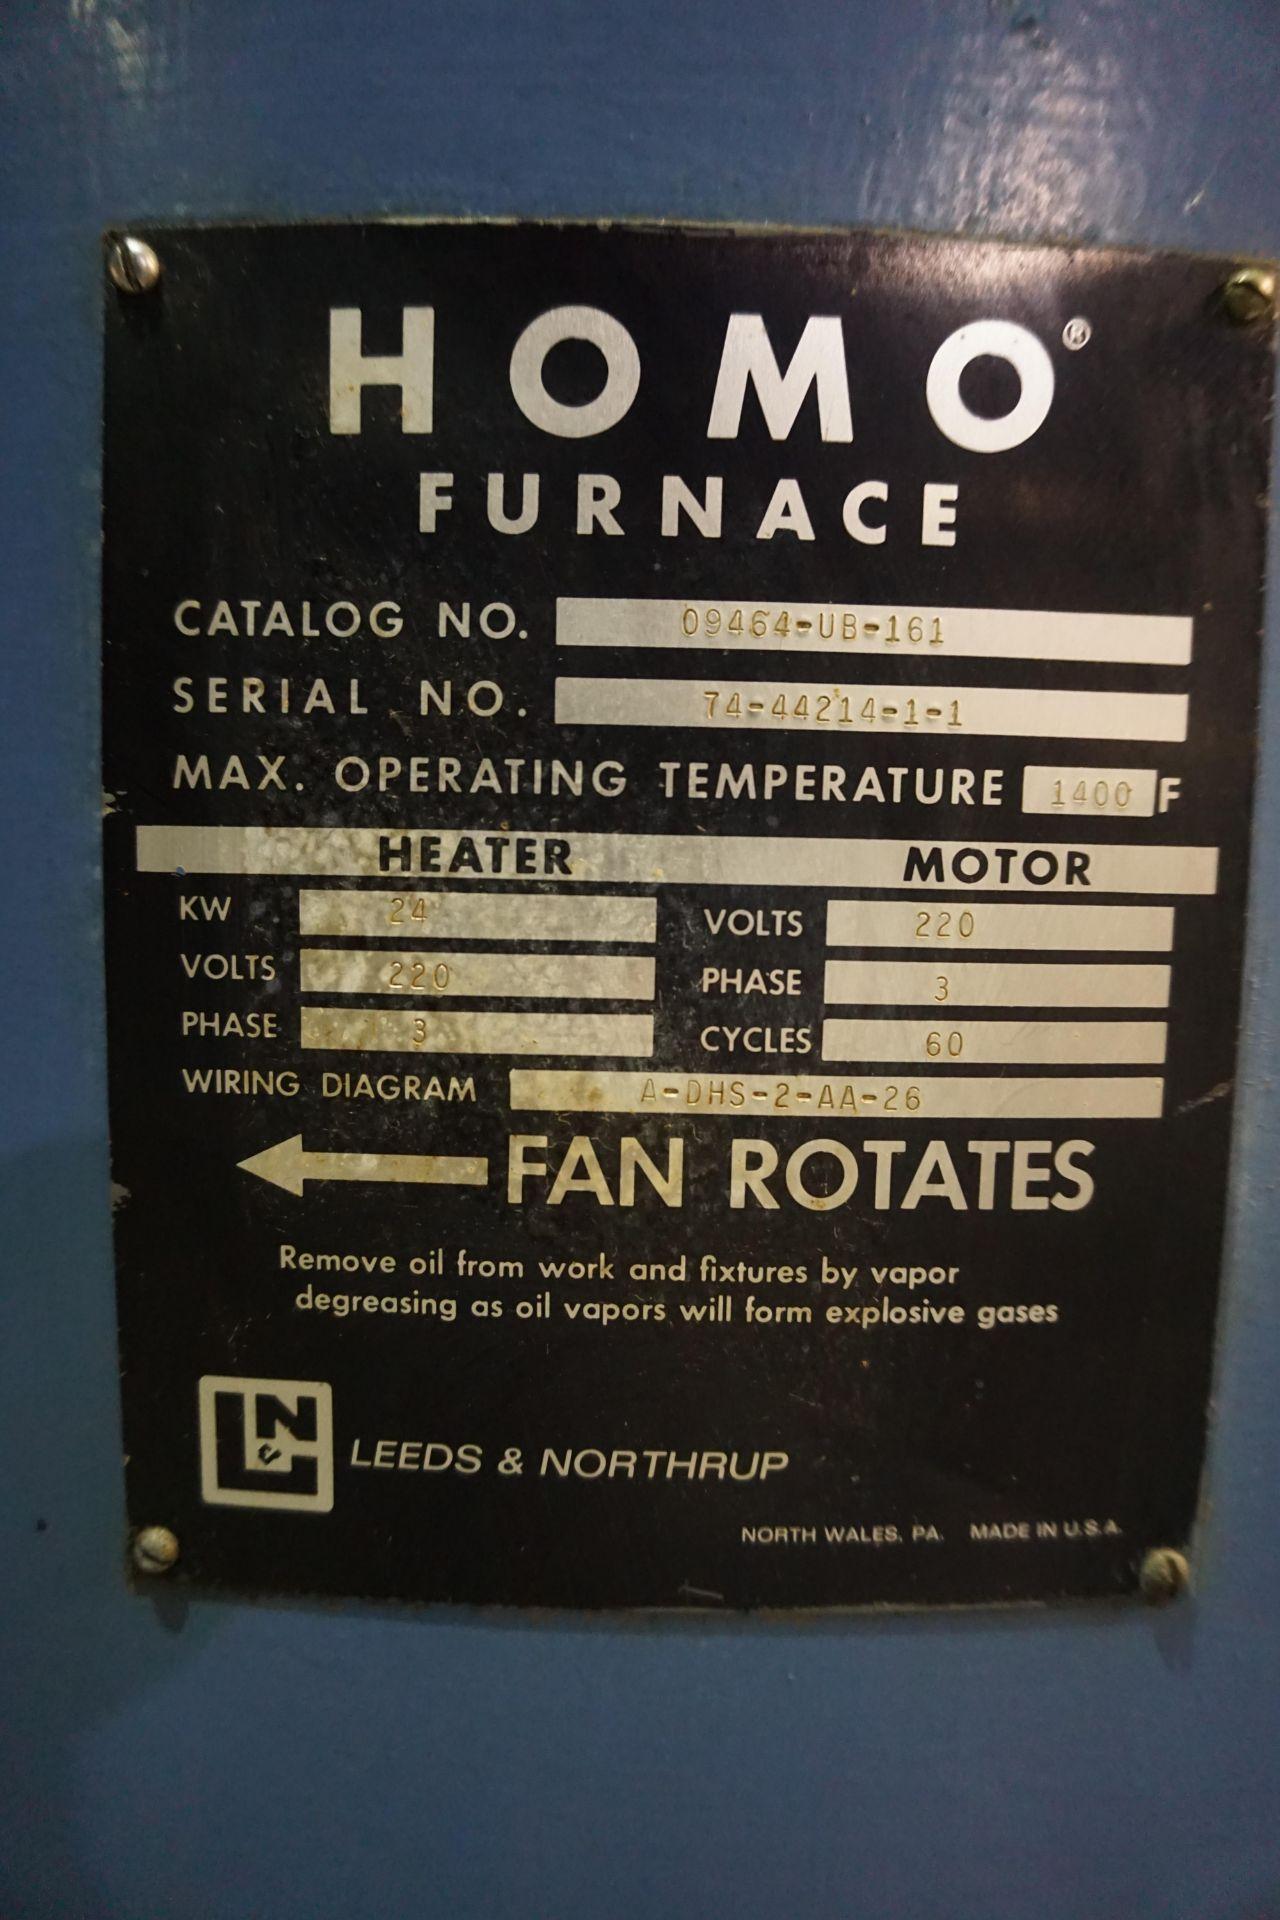 Lot 16 - HOMO FURNACE MDL: 09464-UB-161